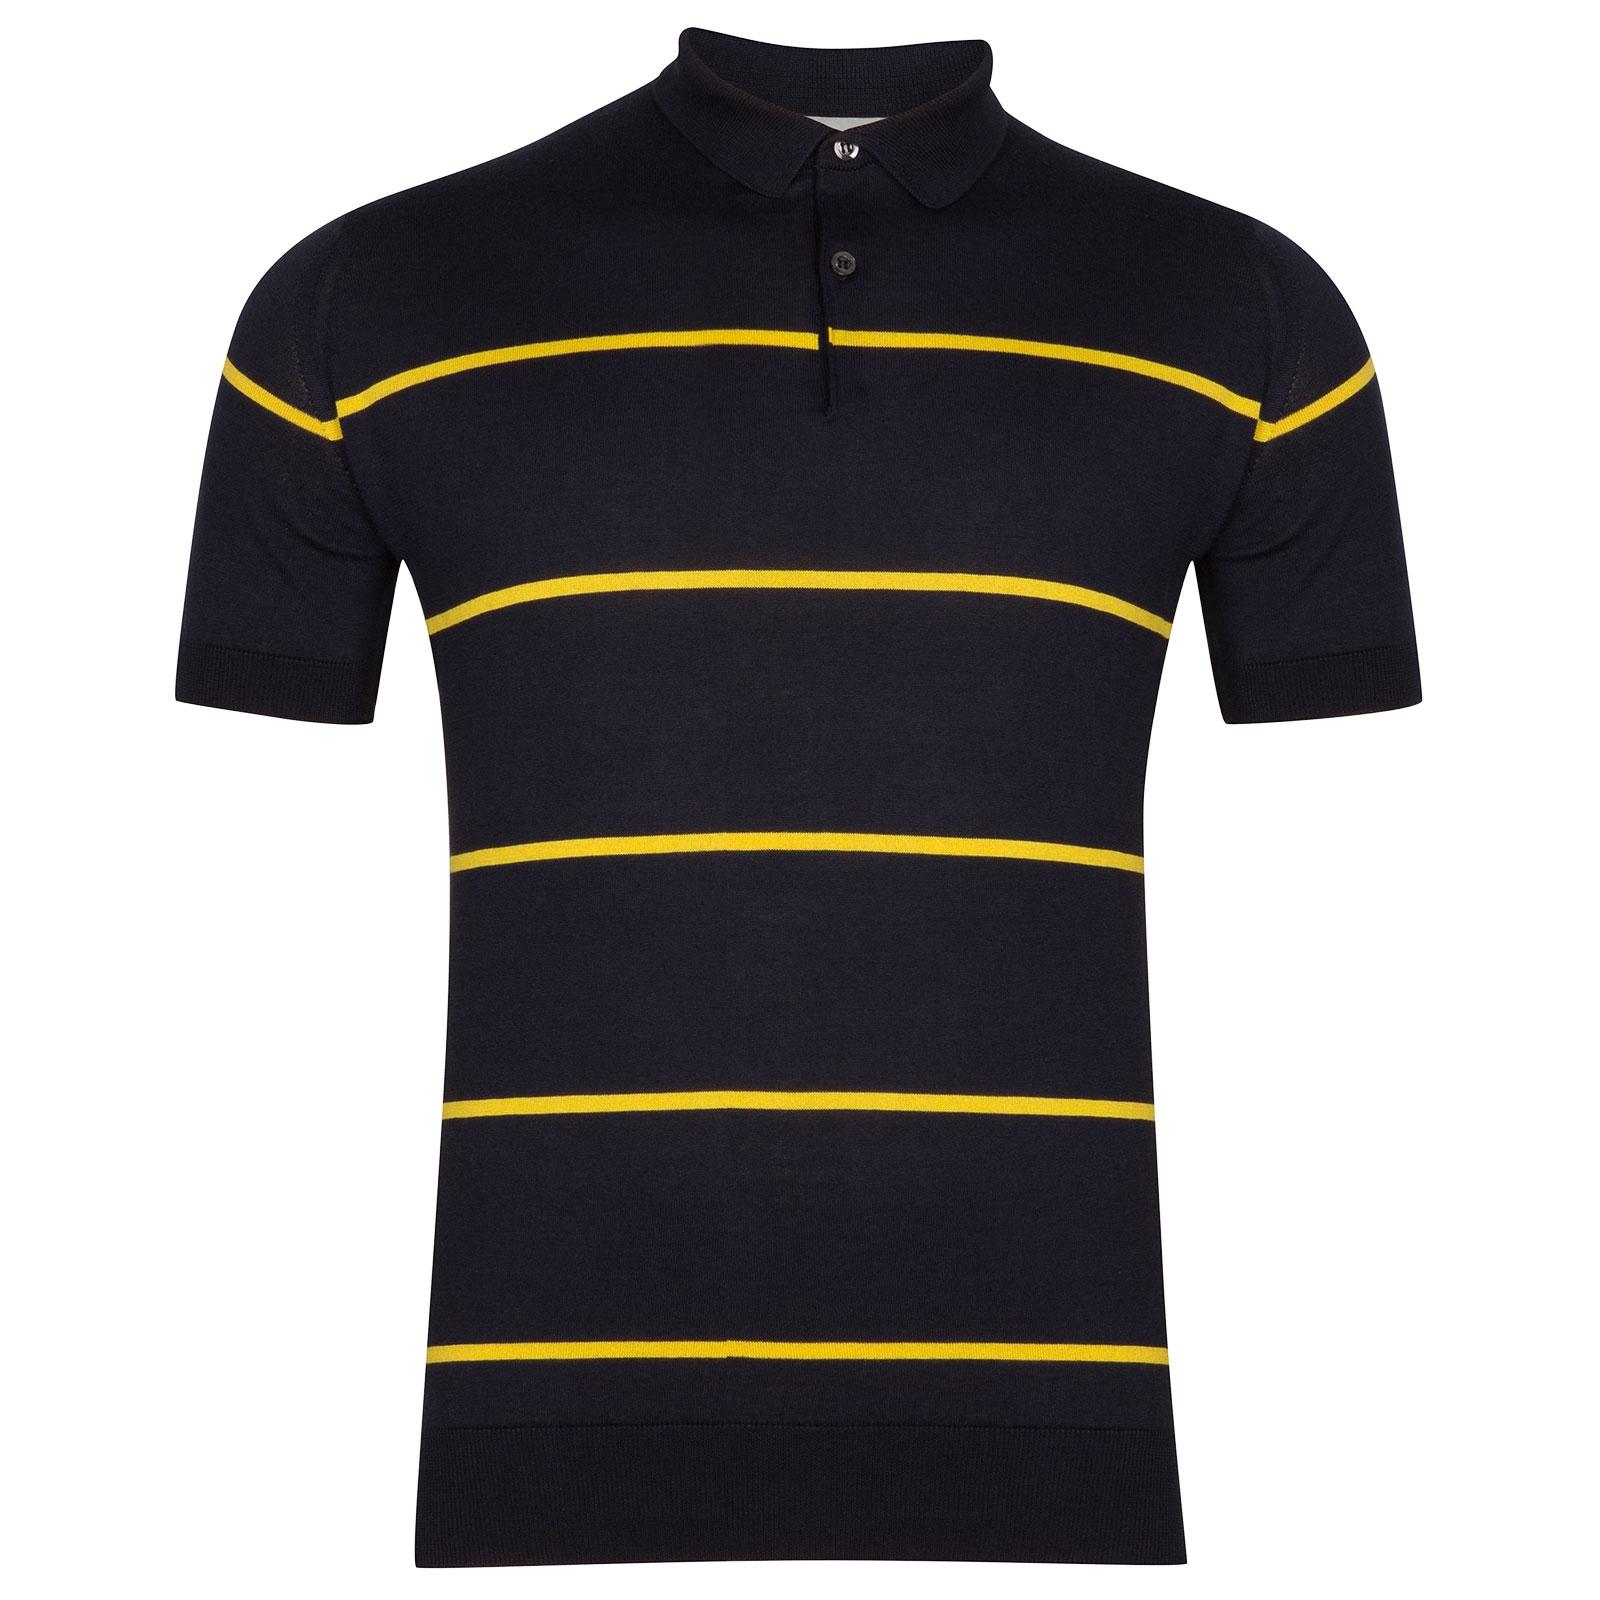 John Smedley Hembury Sea Island Cotton Shirt in Navy-XXL